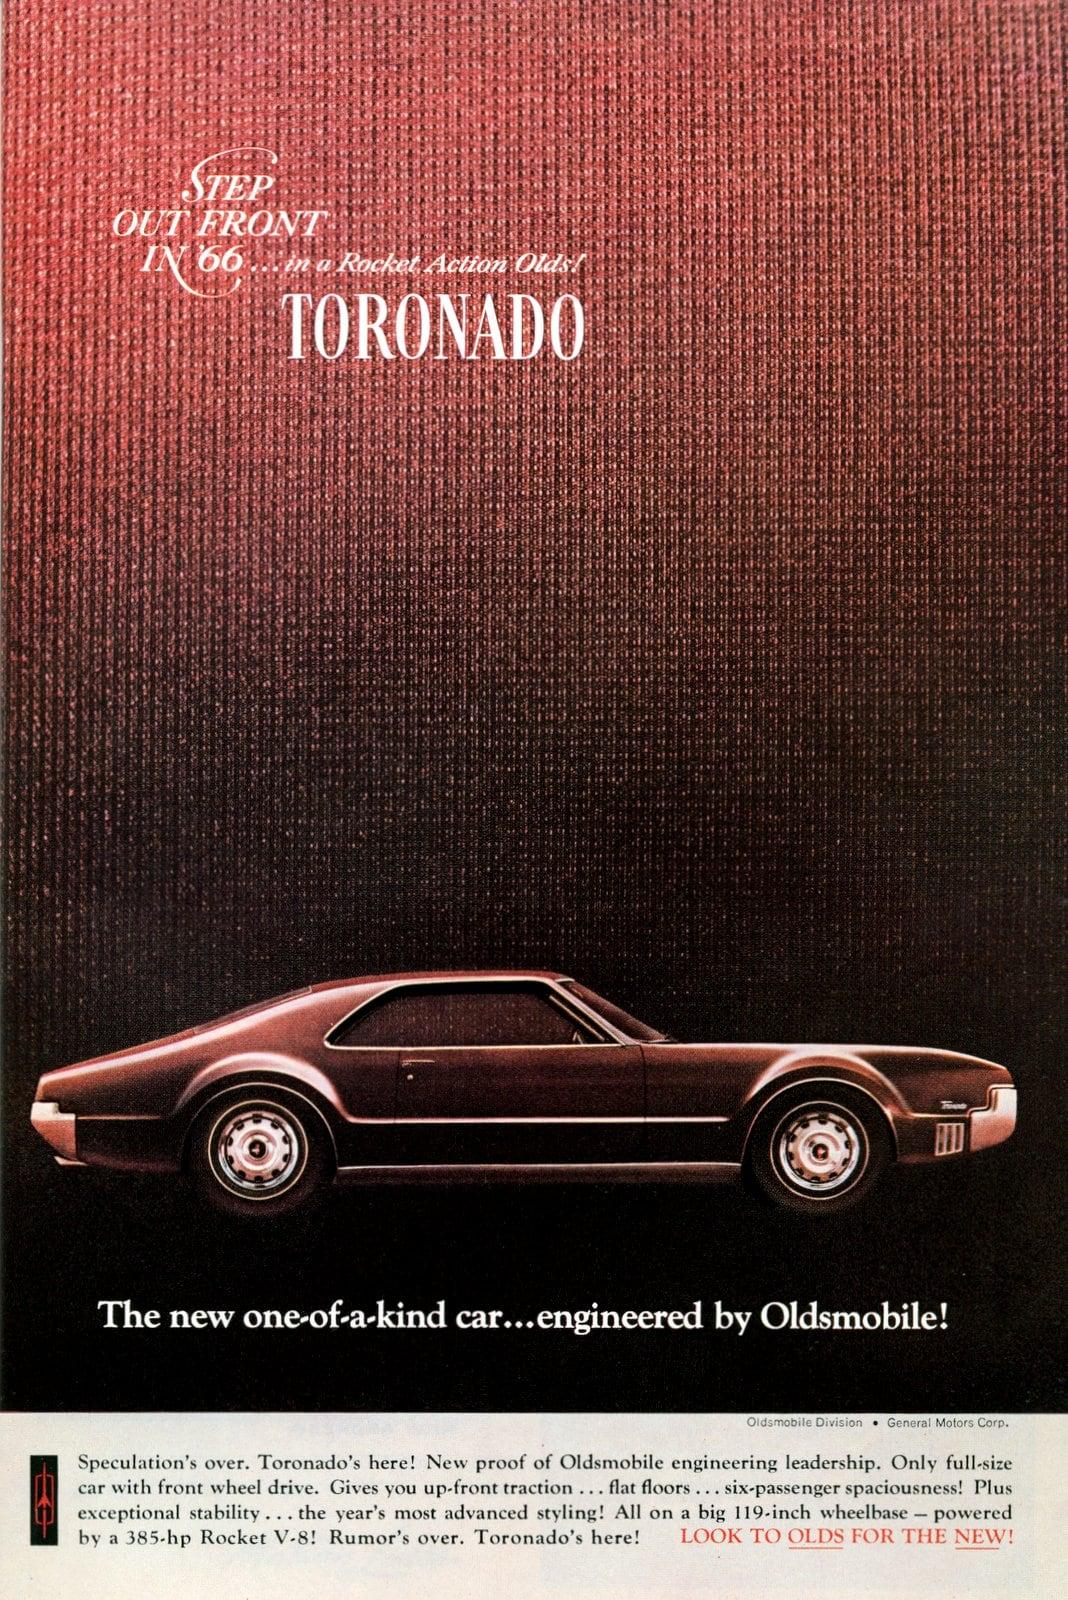 1966 Oldsmobile Toronado classic car ad